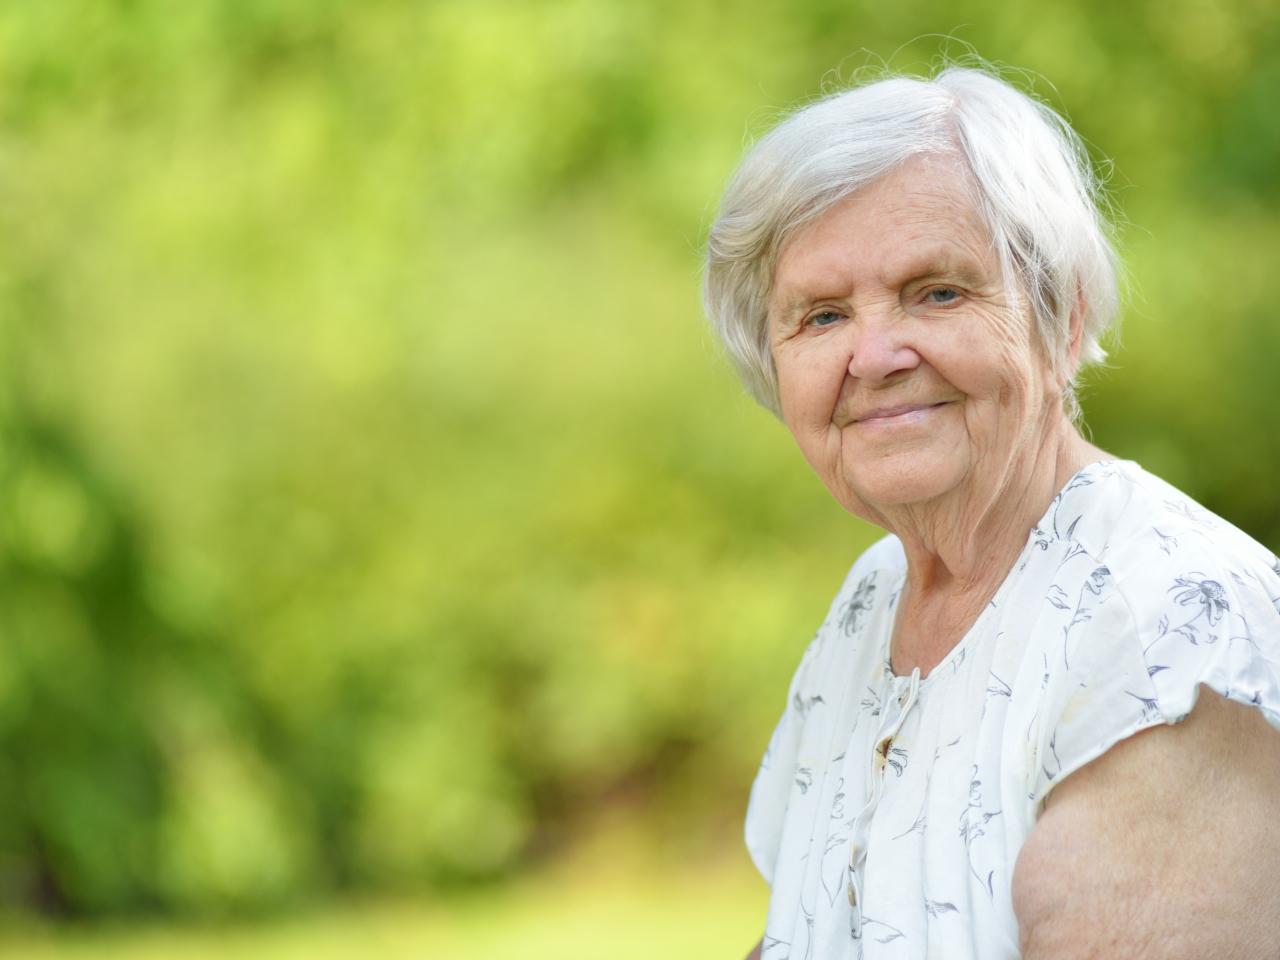 Ältere Frau im Grünen